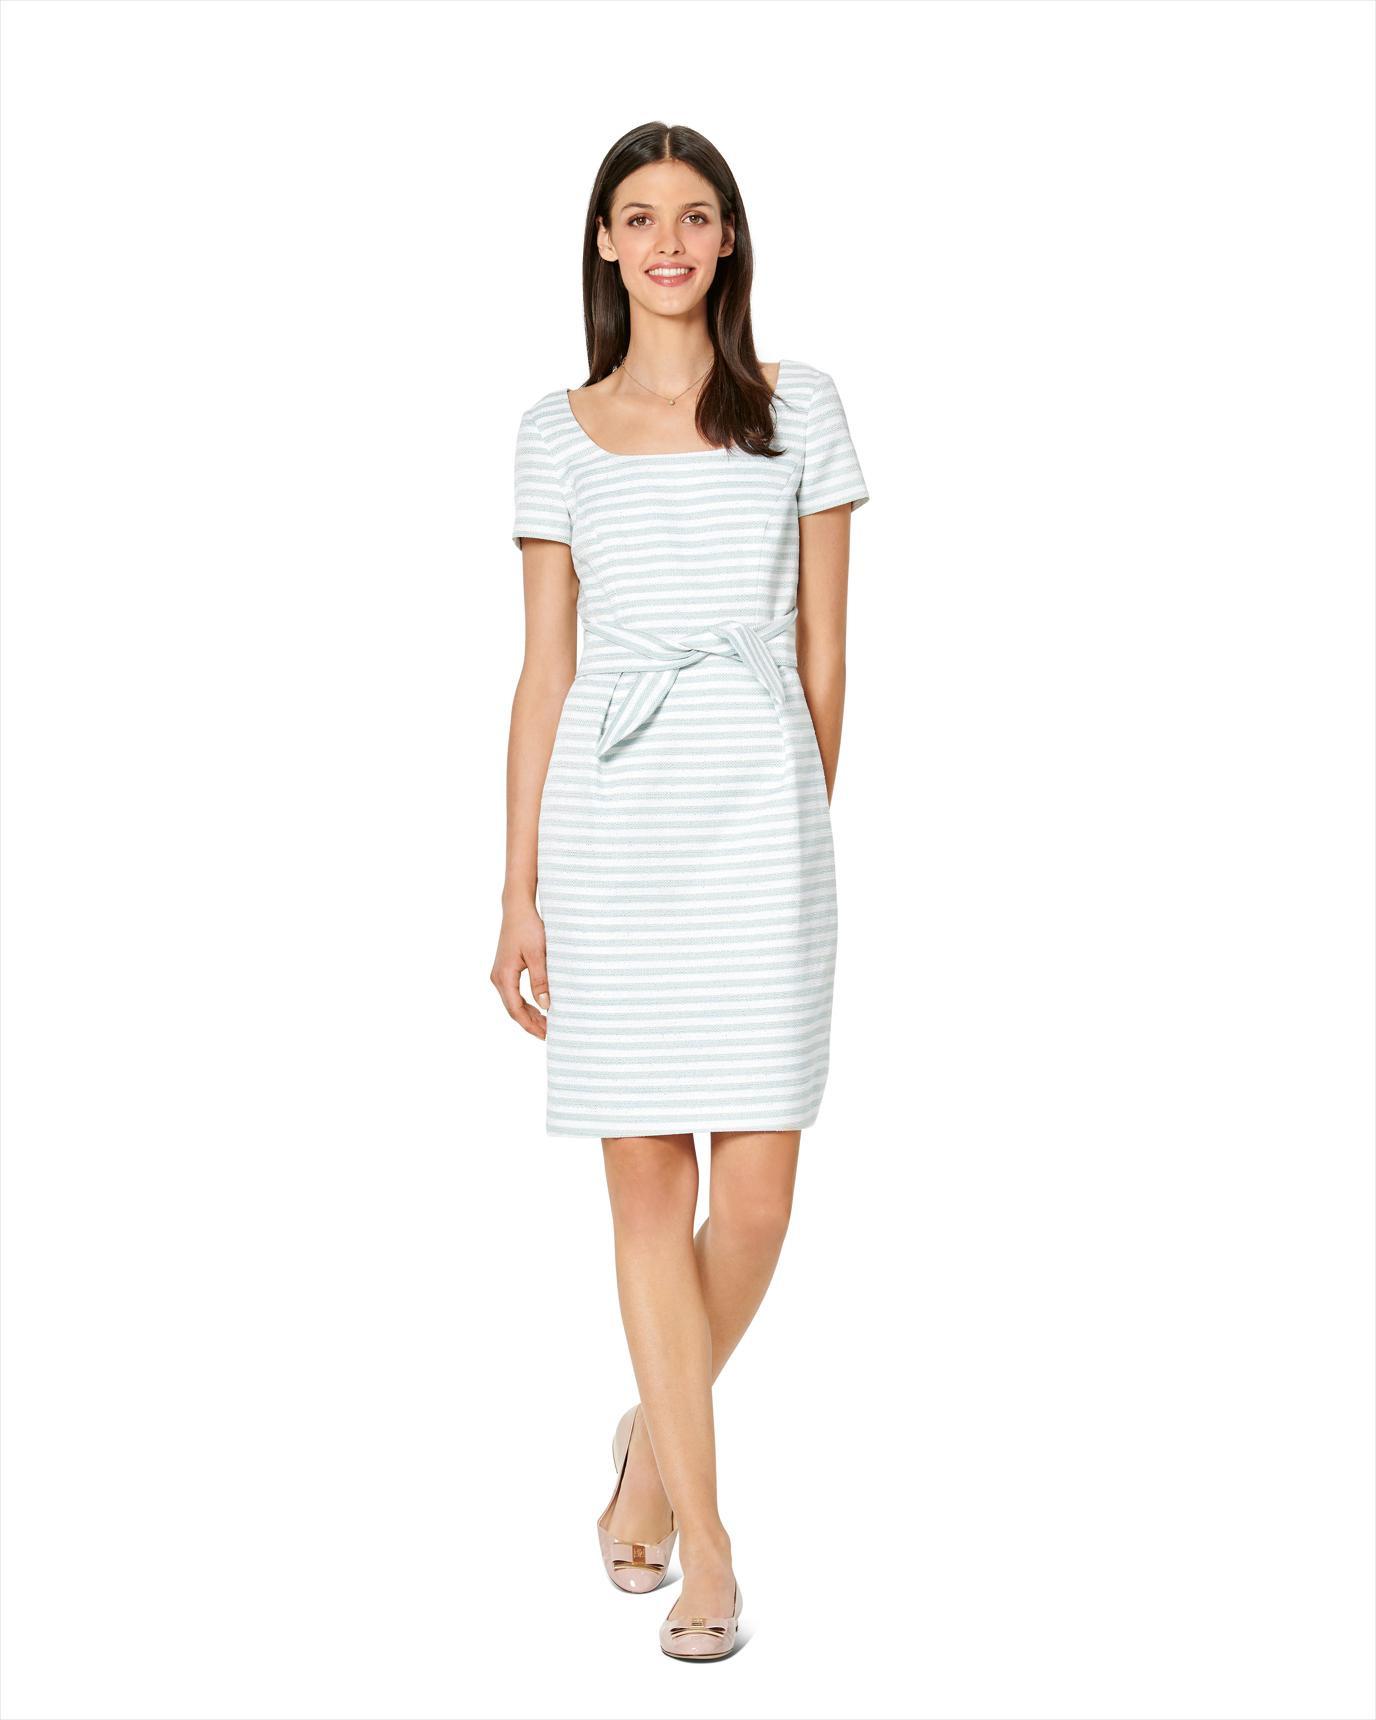 Burda 6220  Kleid  Shiftkleid  Carréausschnitt